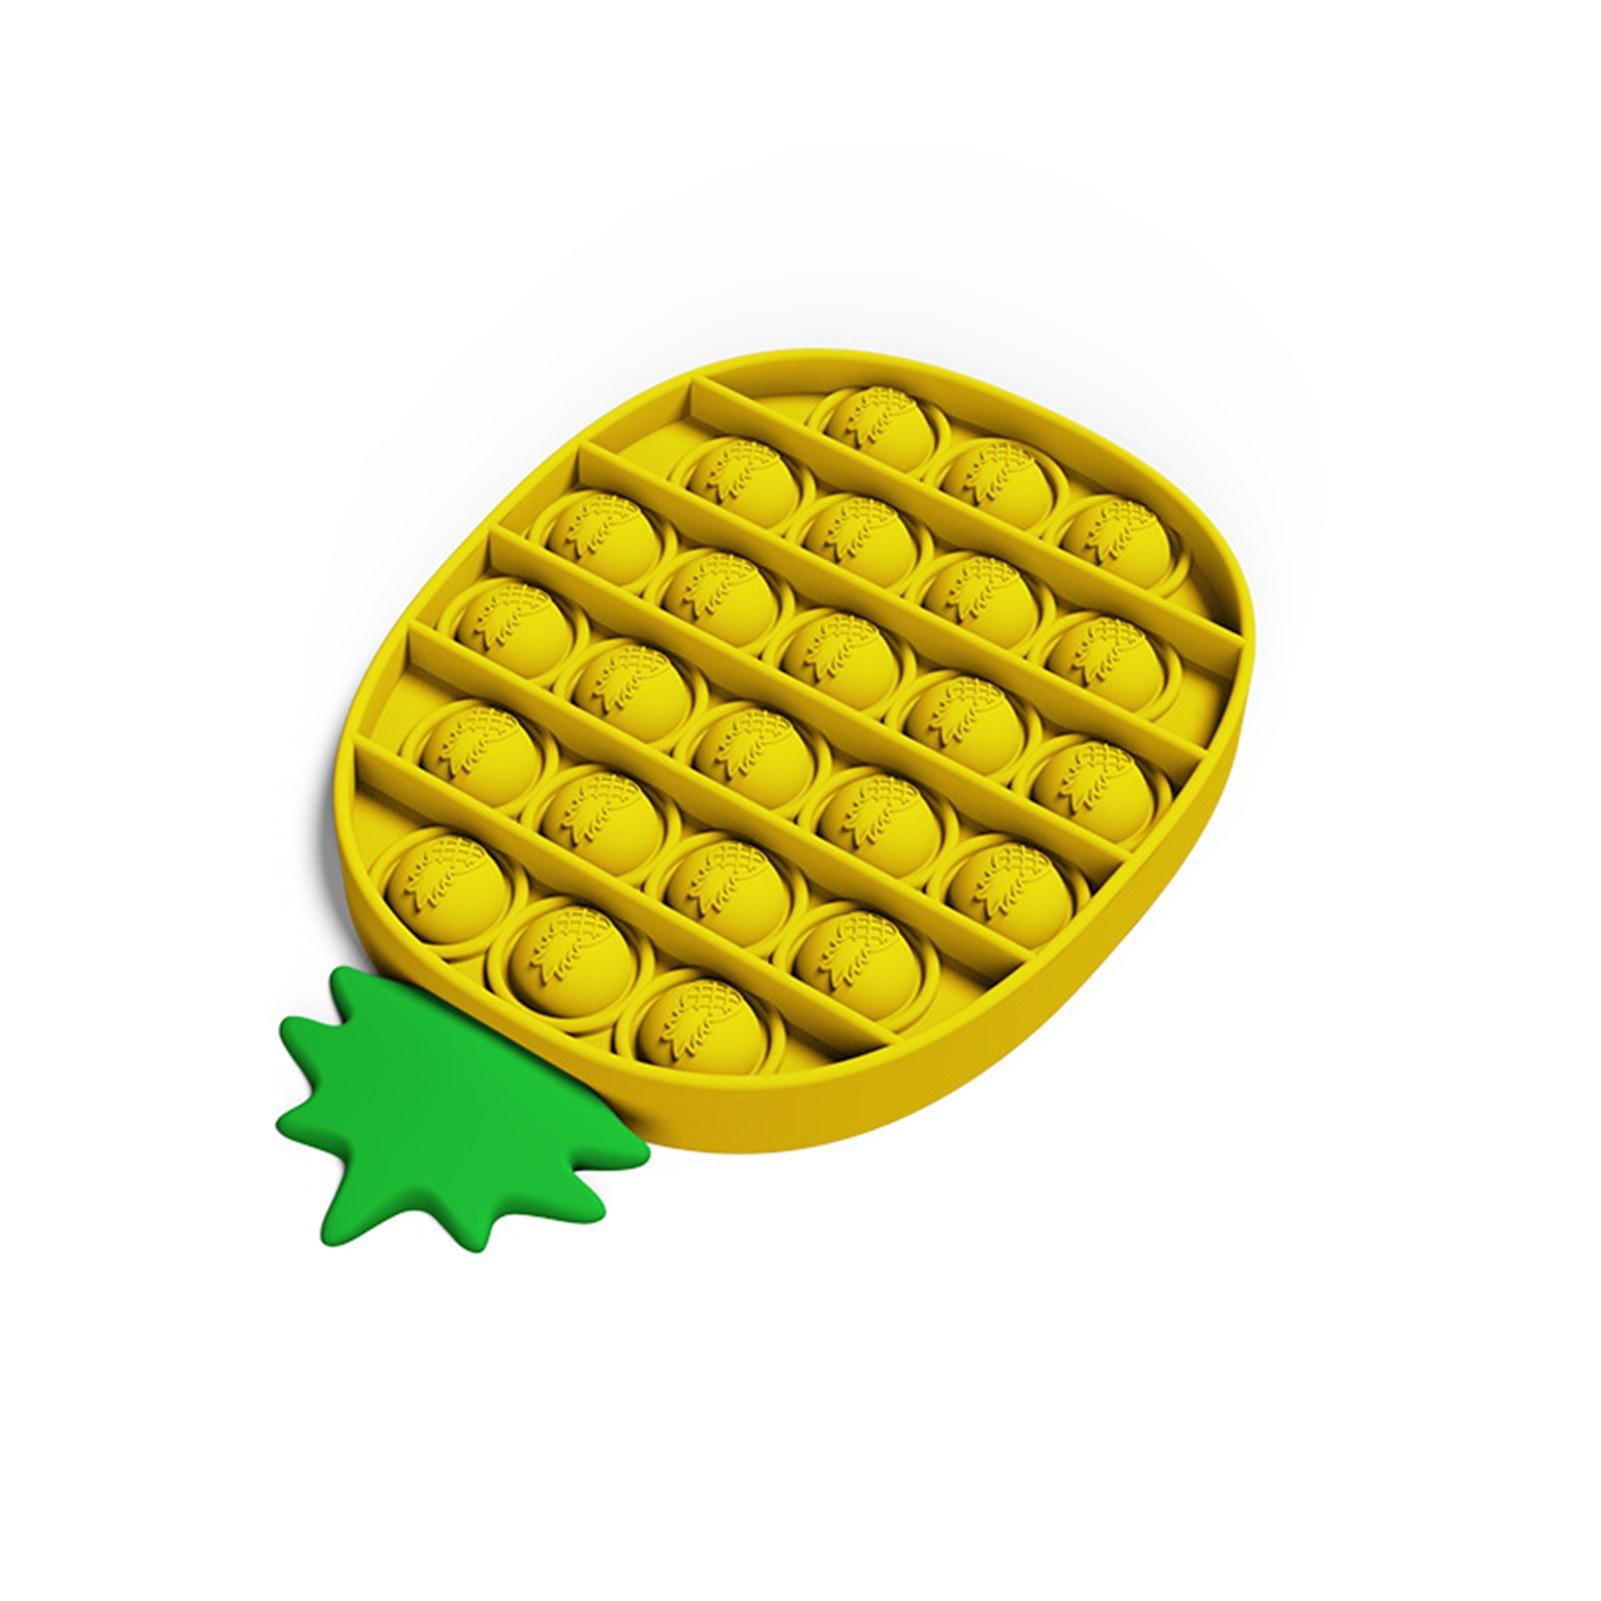 Push Pop bulle Fidget ananas anti-Stress-jouets anti-Stress, jouets éducatifs de table jouets sensoriels, Stress et anxiété